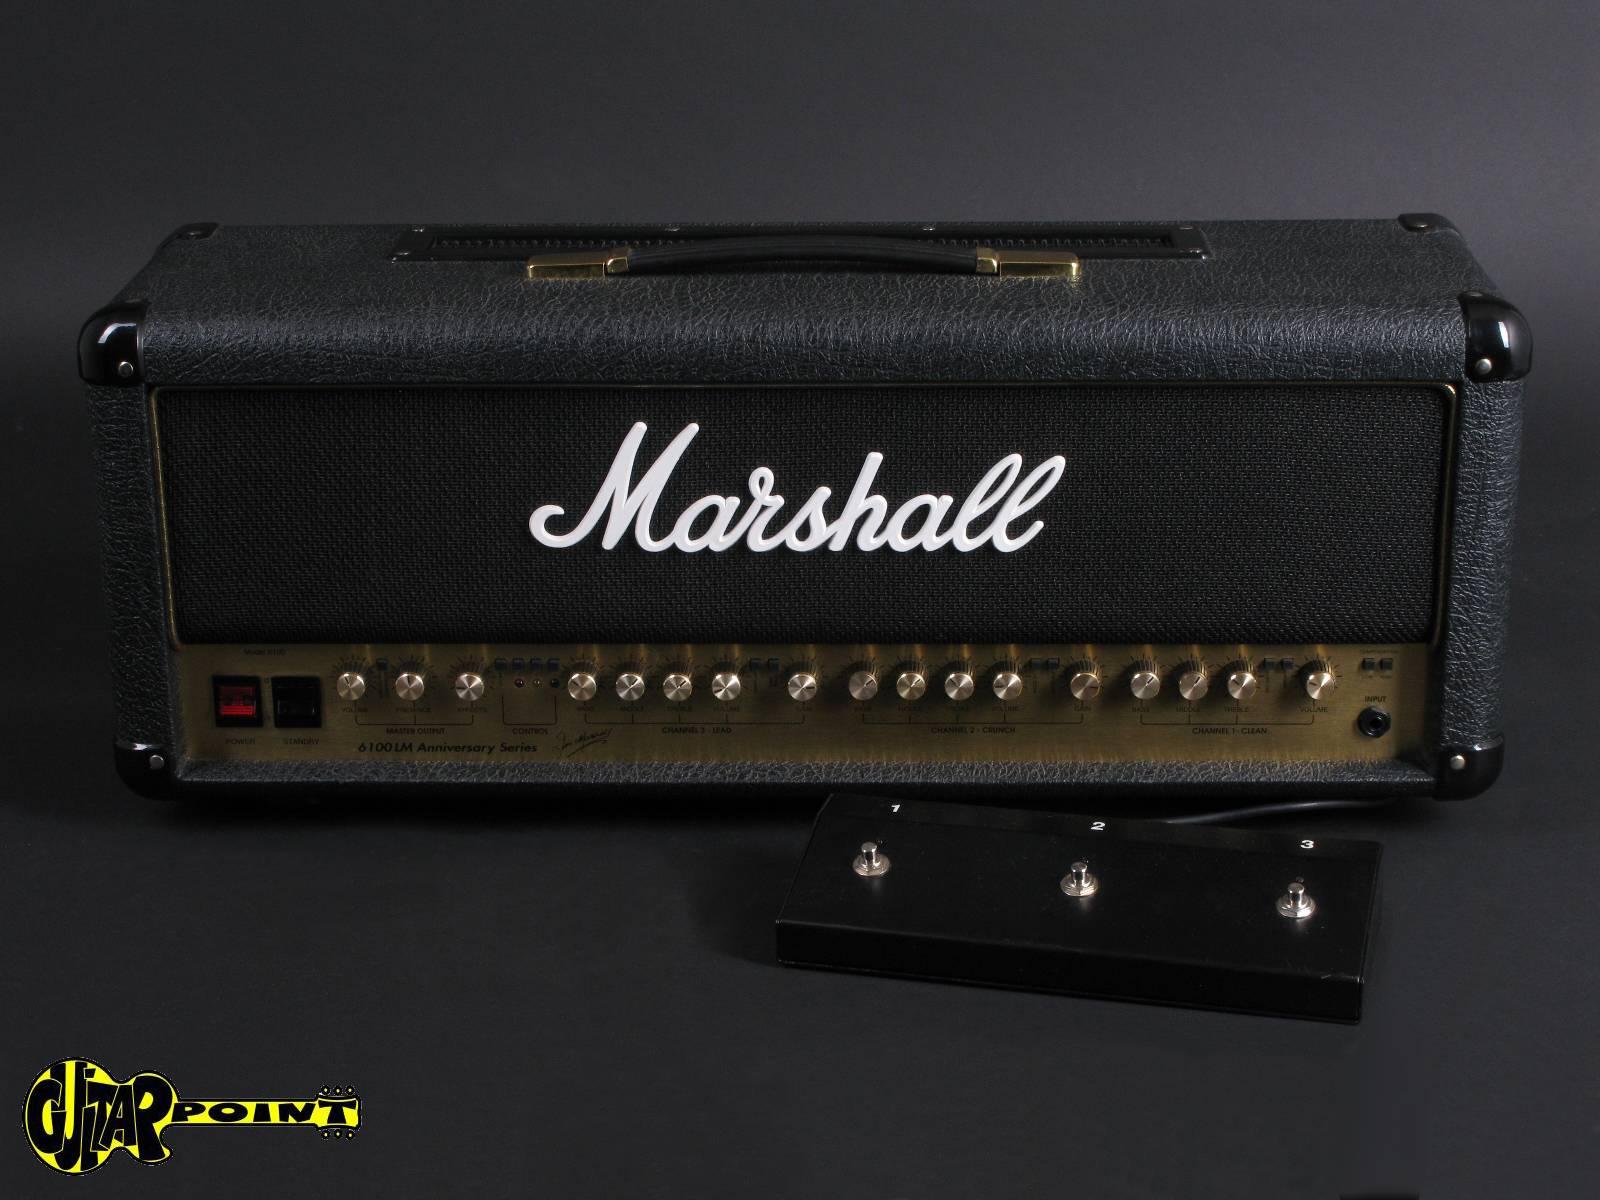 1996 Marshall LM 6100 30th Anniversary